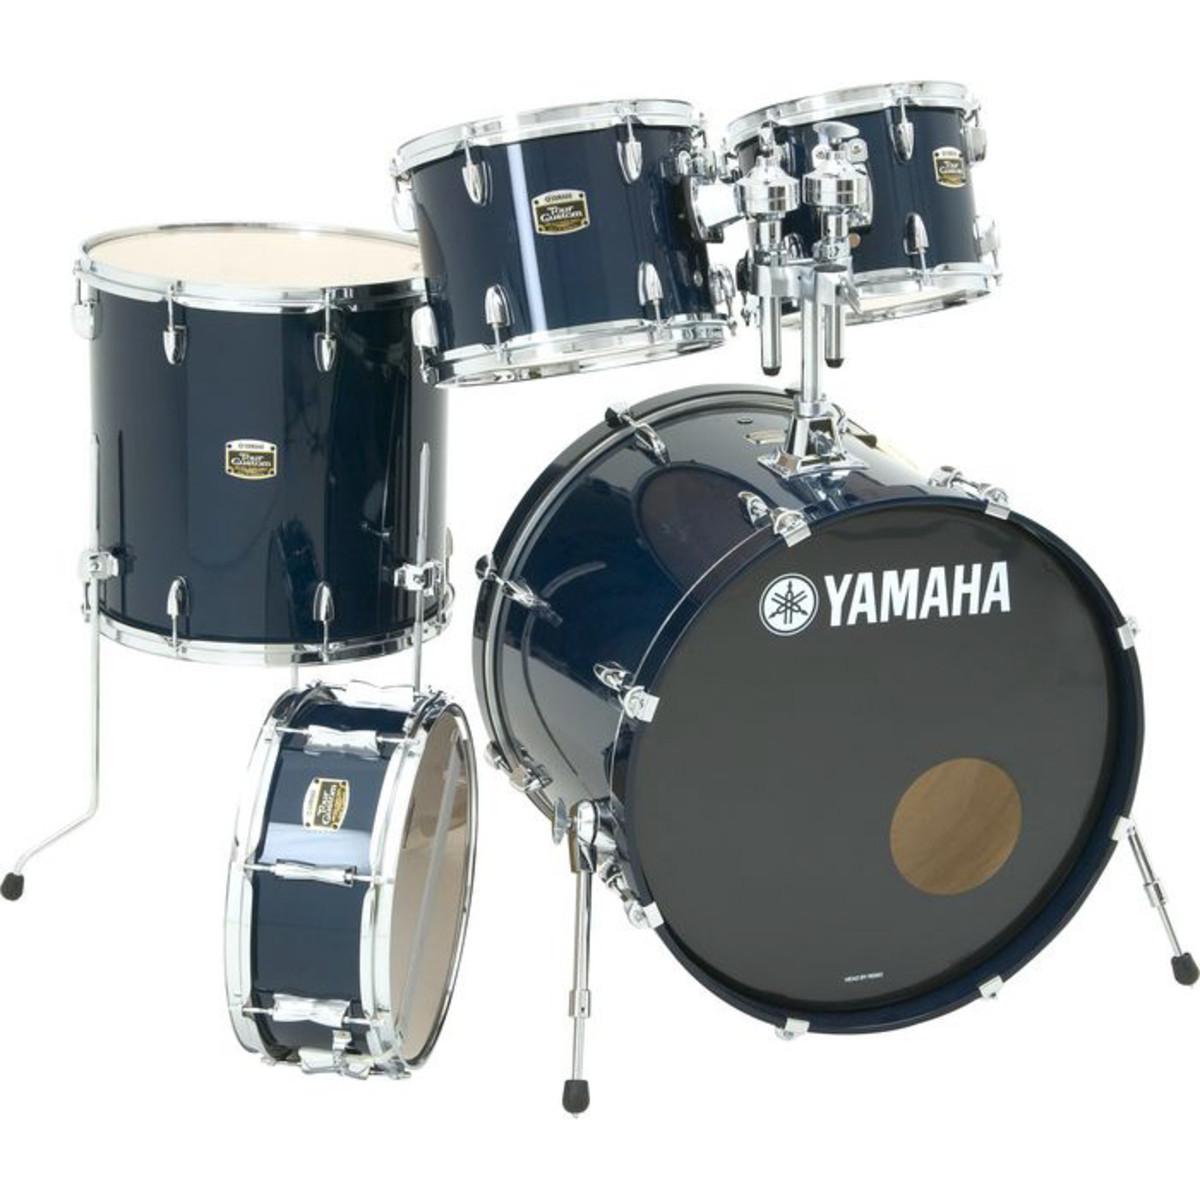 yamaha tour custom 5 piece shell set ocean blue at gear4music. Black Bedroom Furniture Sets. Home Design Ideas